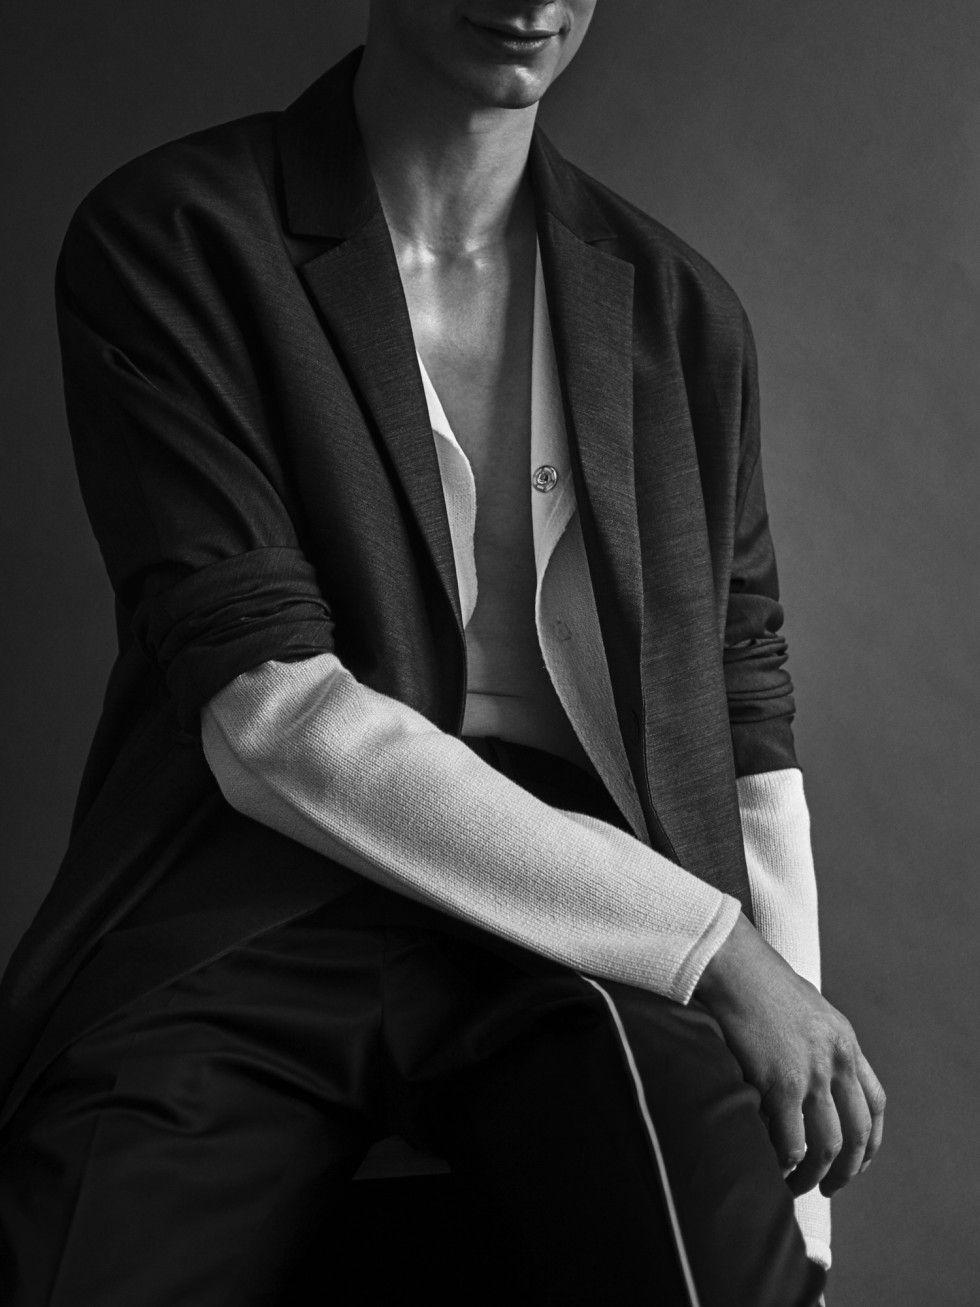 20150609_HungerTV_Milan_08_230_F2 photographer Emma Gibney